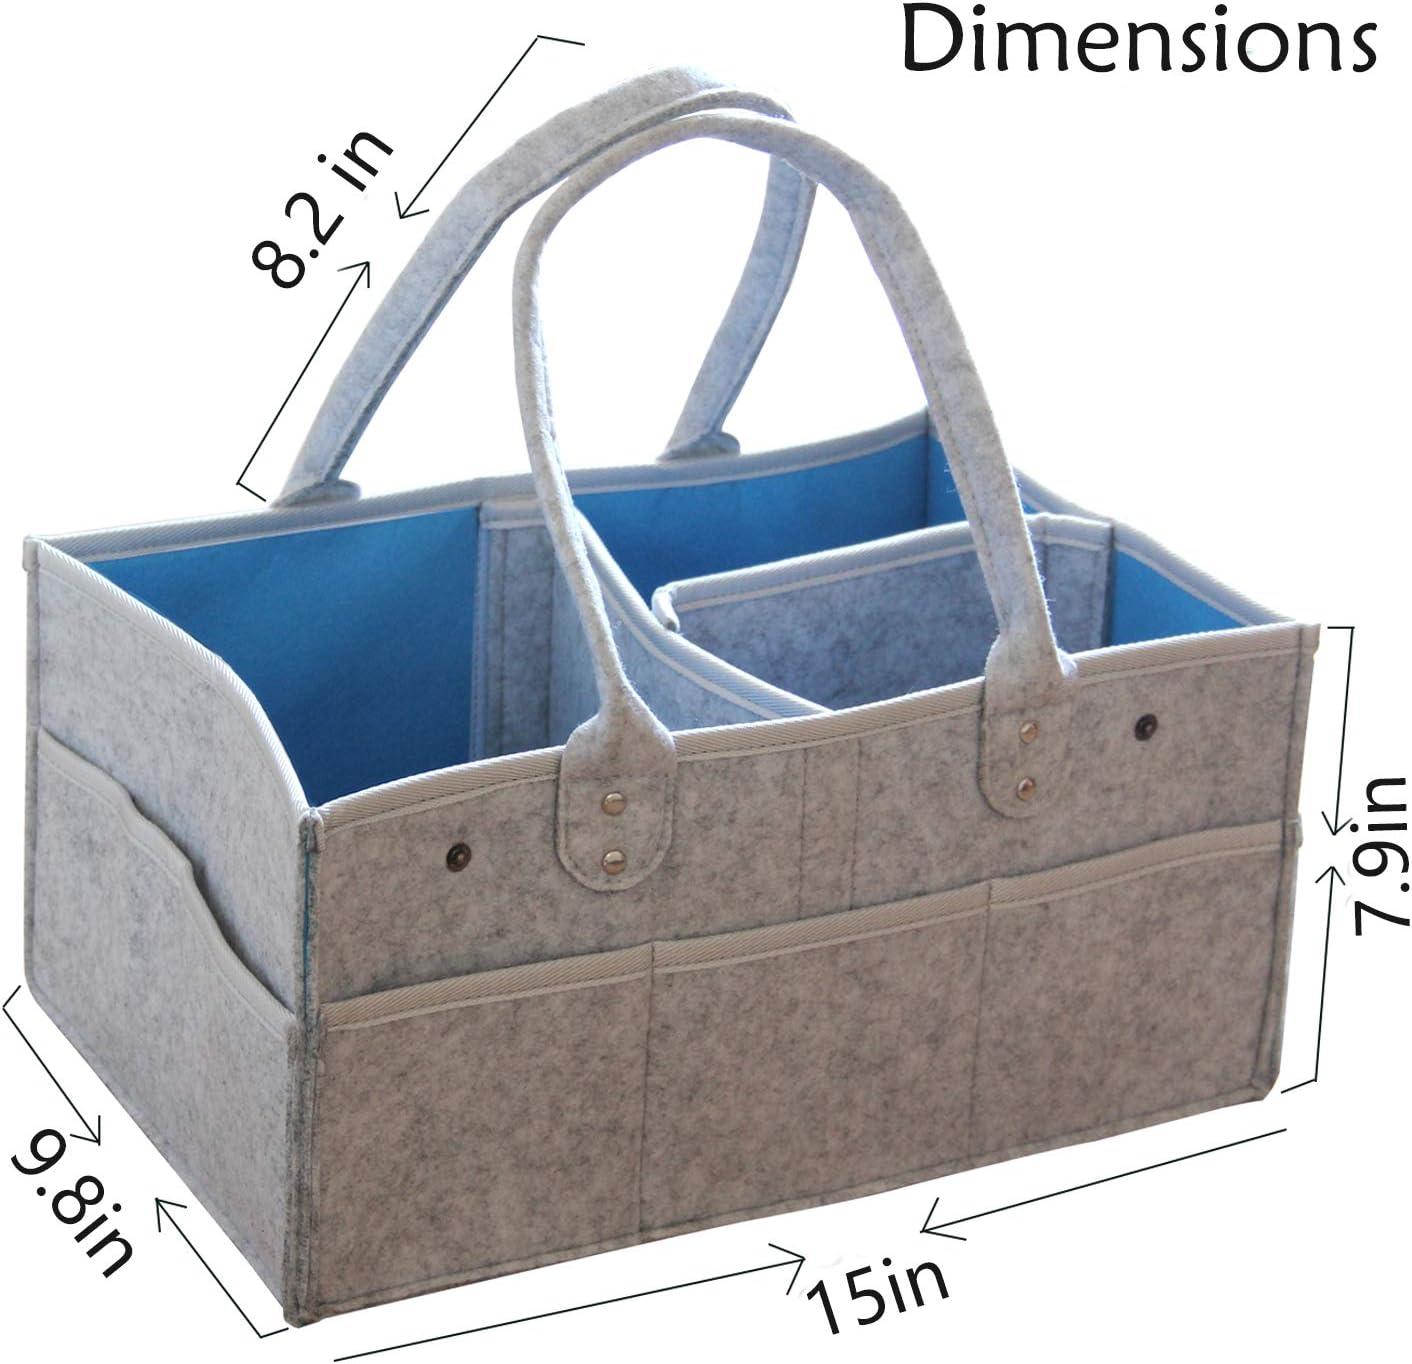 with Dust Cover,Infant Portable Organizer AEESRRU Organizer Nursery Storage Bin Car Organizer for Diapers and Baby Wipes UpgradeBoy Girl Diaper Storage Bin for Baby Diaper Caddy